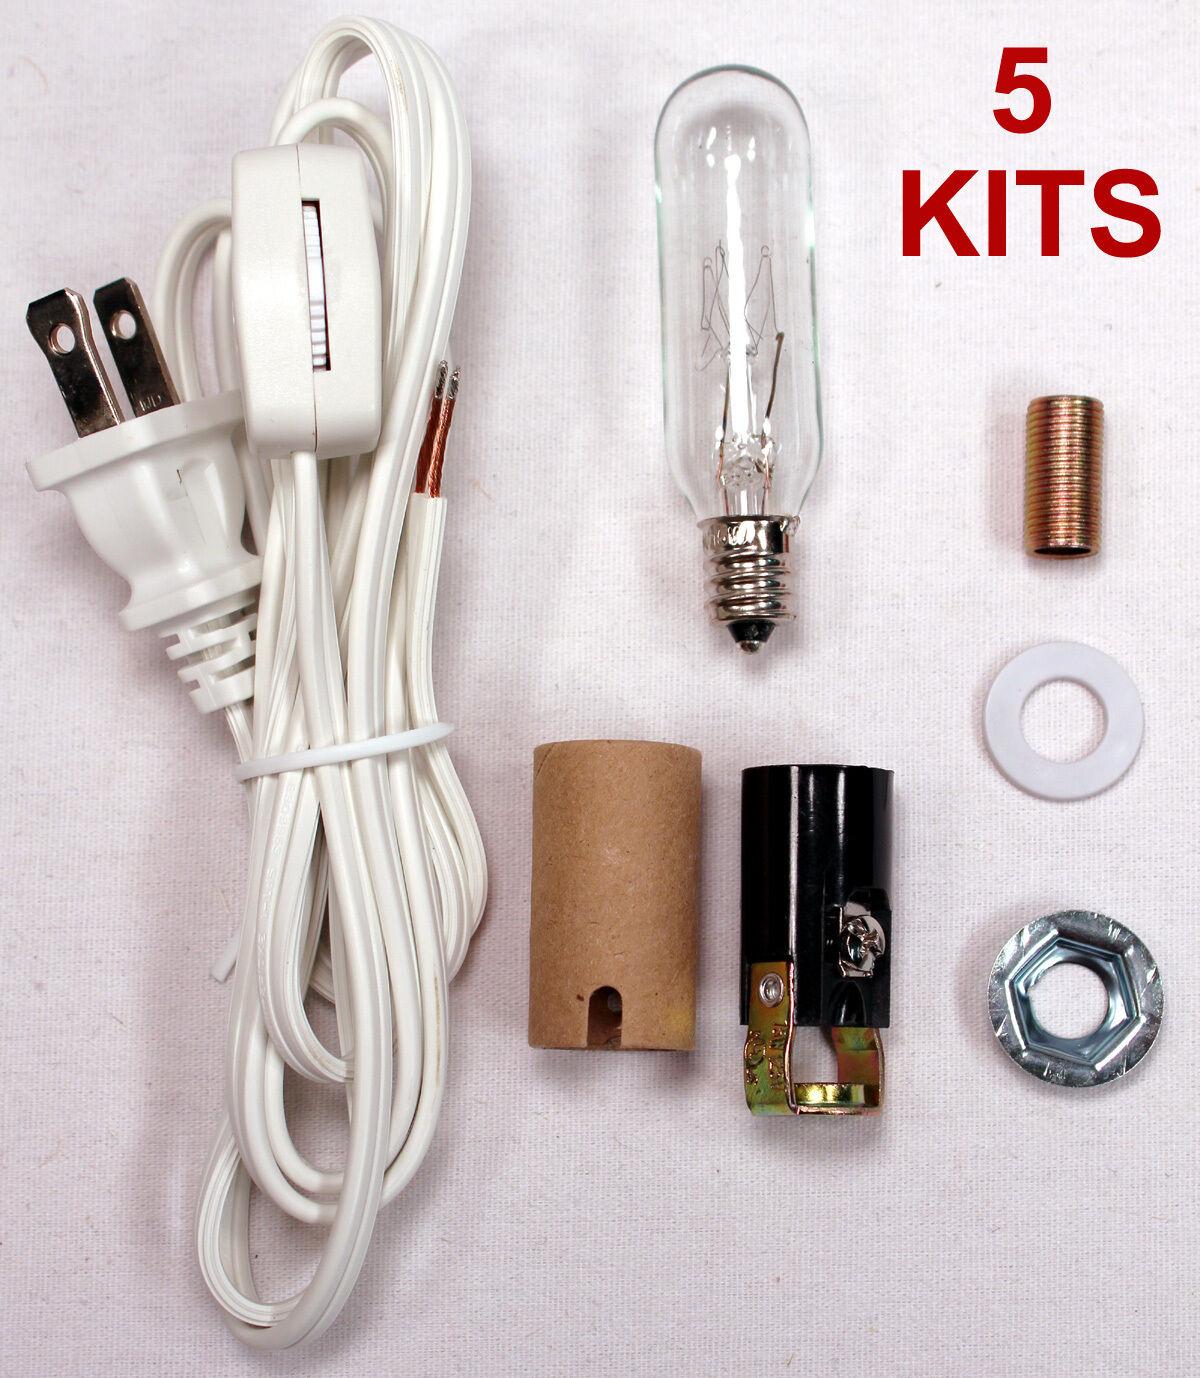 Lot of 5 – Medium Christmas Tree Wiring Kit ML2-25B6, 25 Watt Lamp Lighting Kit Collectibles